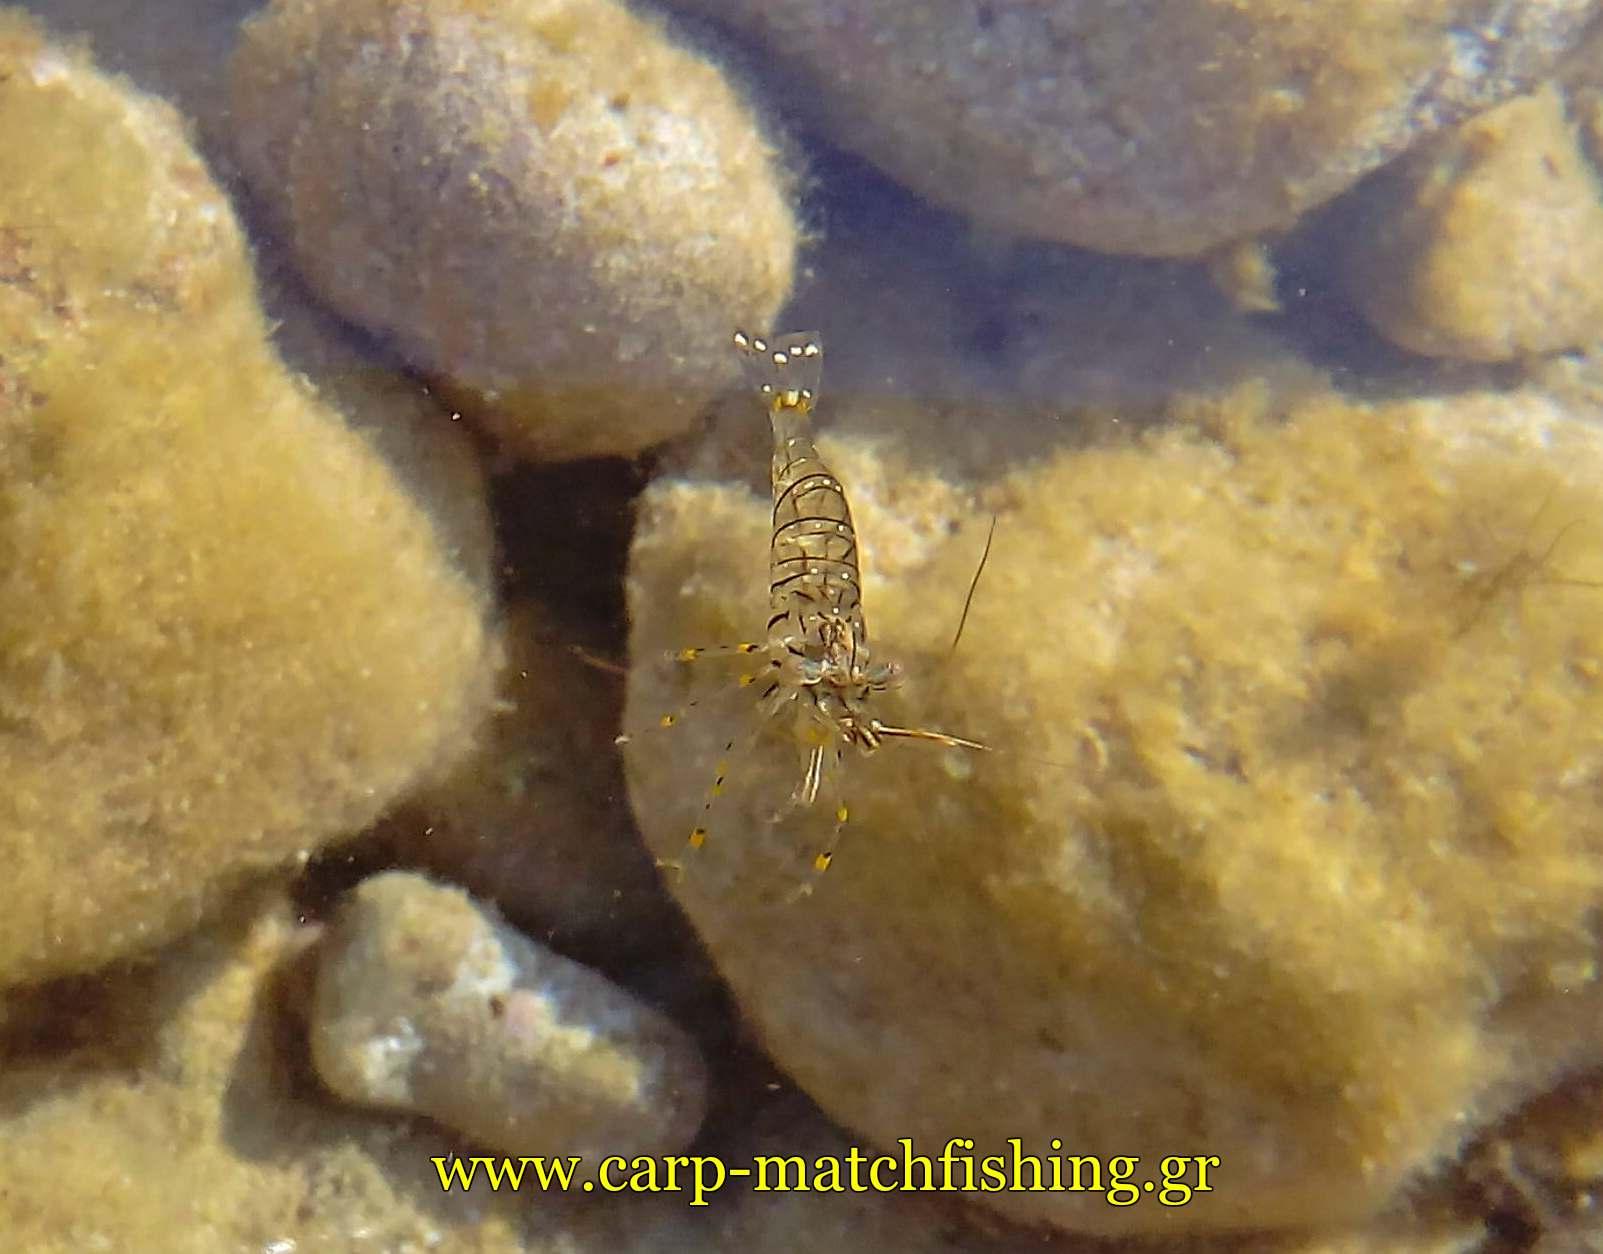 zontani garida carpmatchfishing